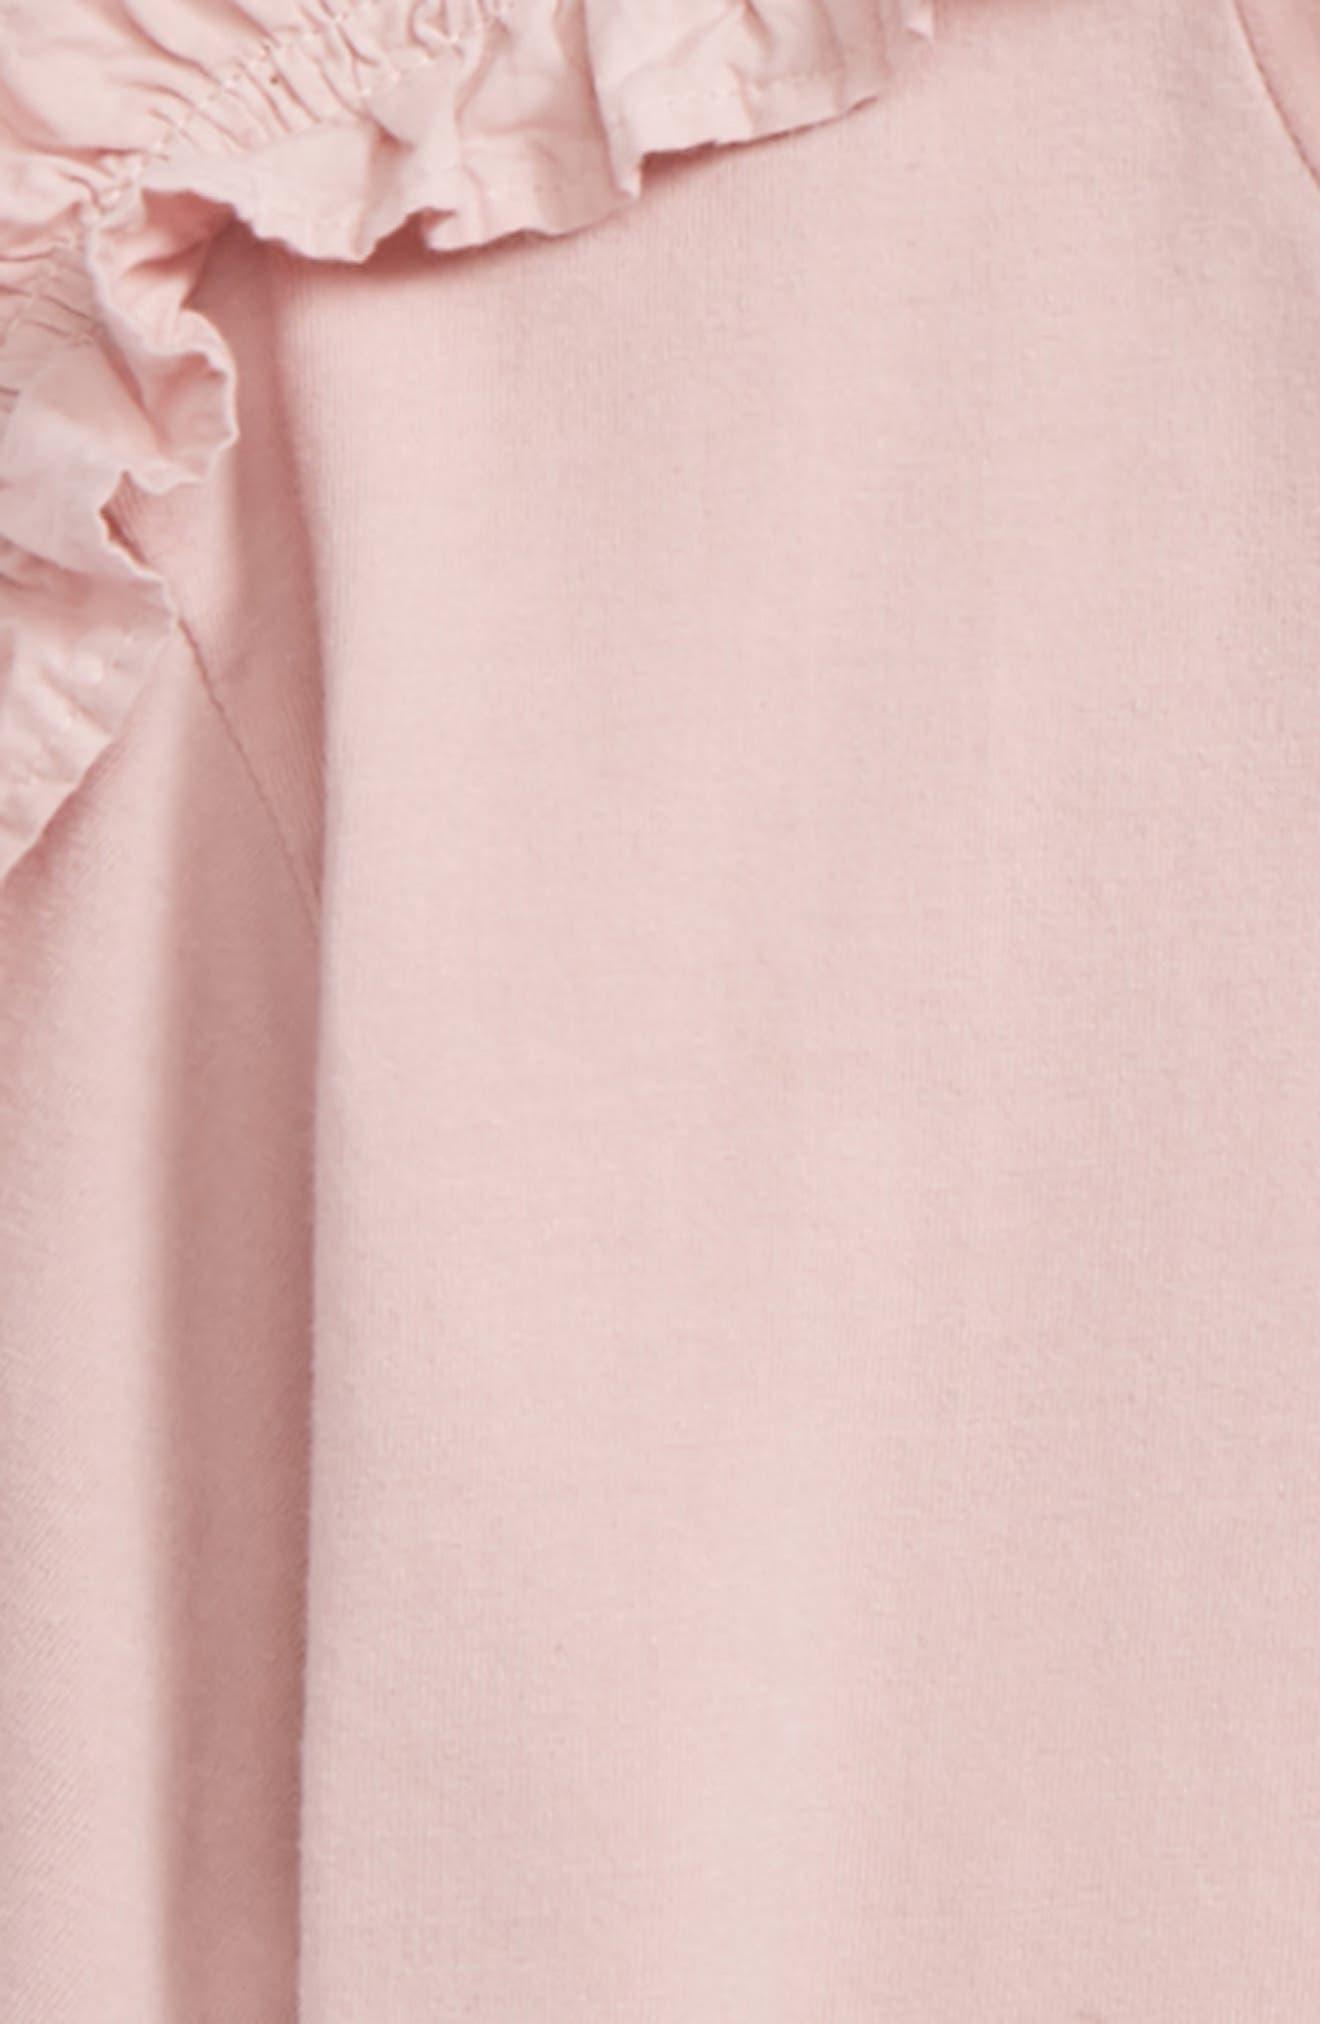 Ruffle Sleeve Tee,                             Alternate thumbnail 2, color,                             Pink Apricot